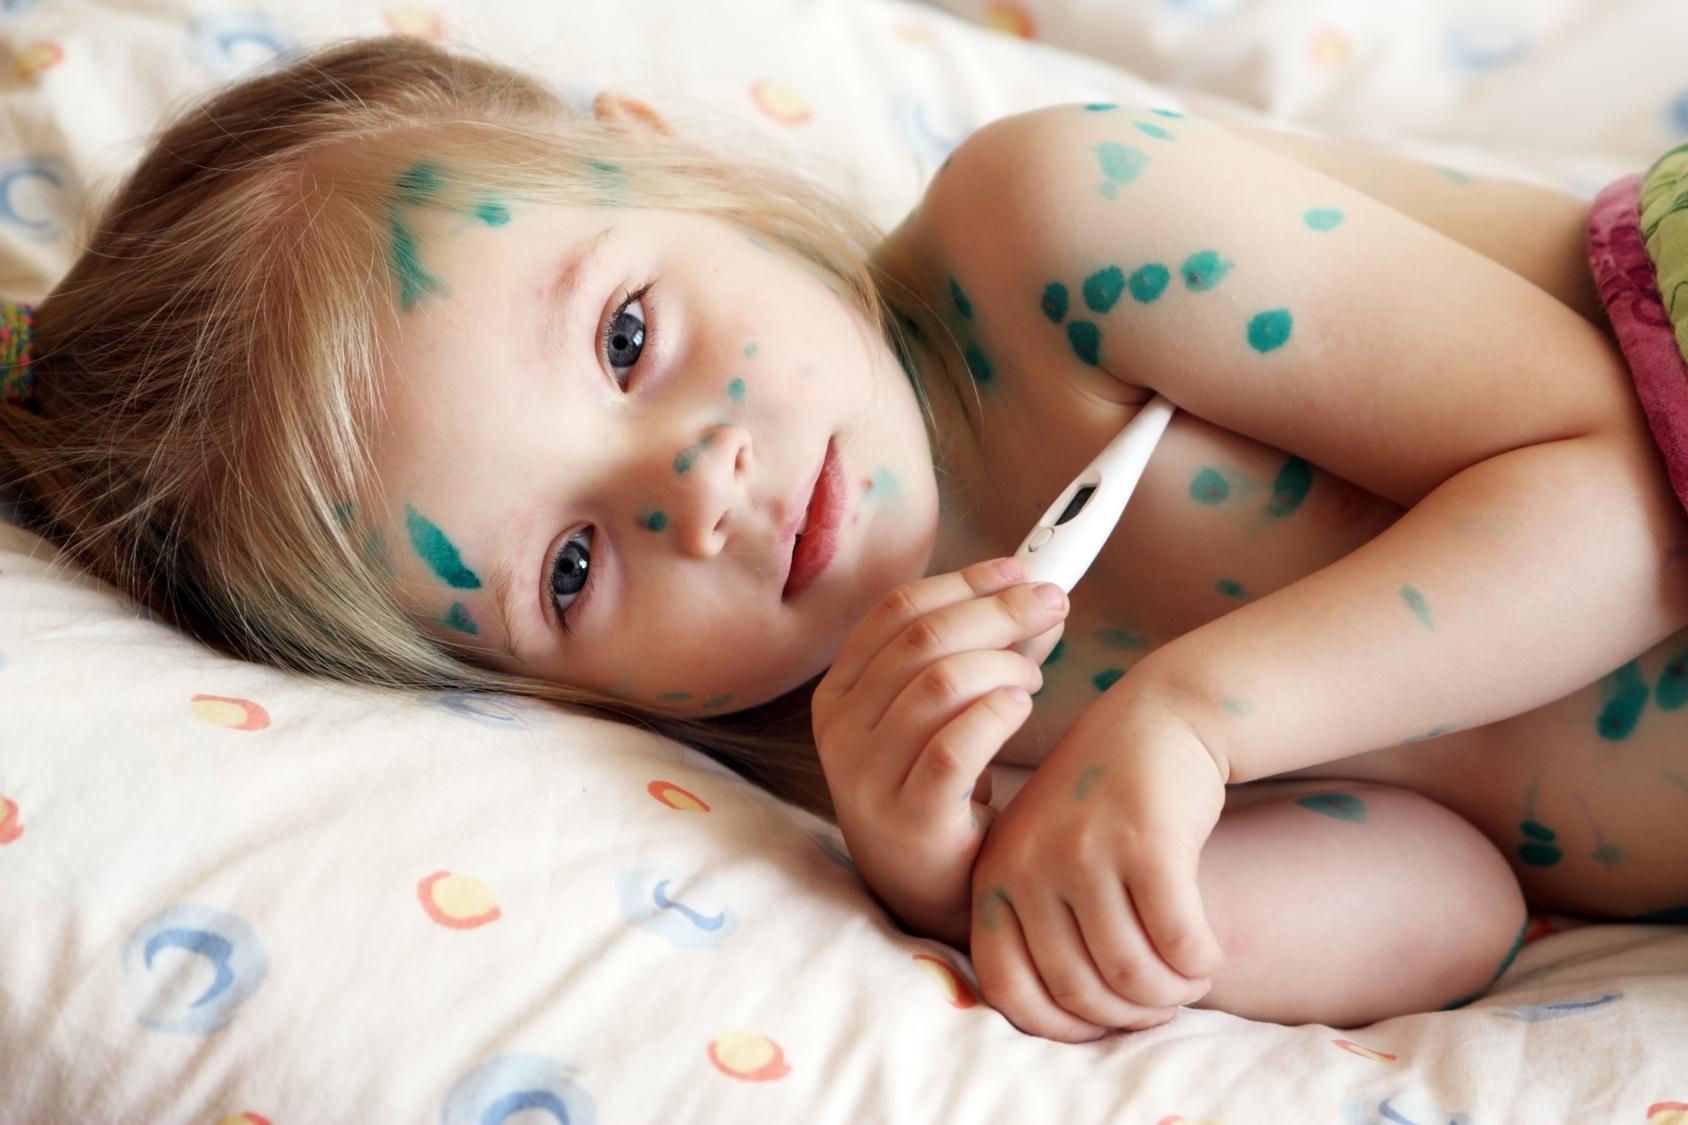 аллергия на ацикловир у взрослых